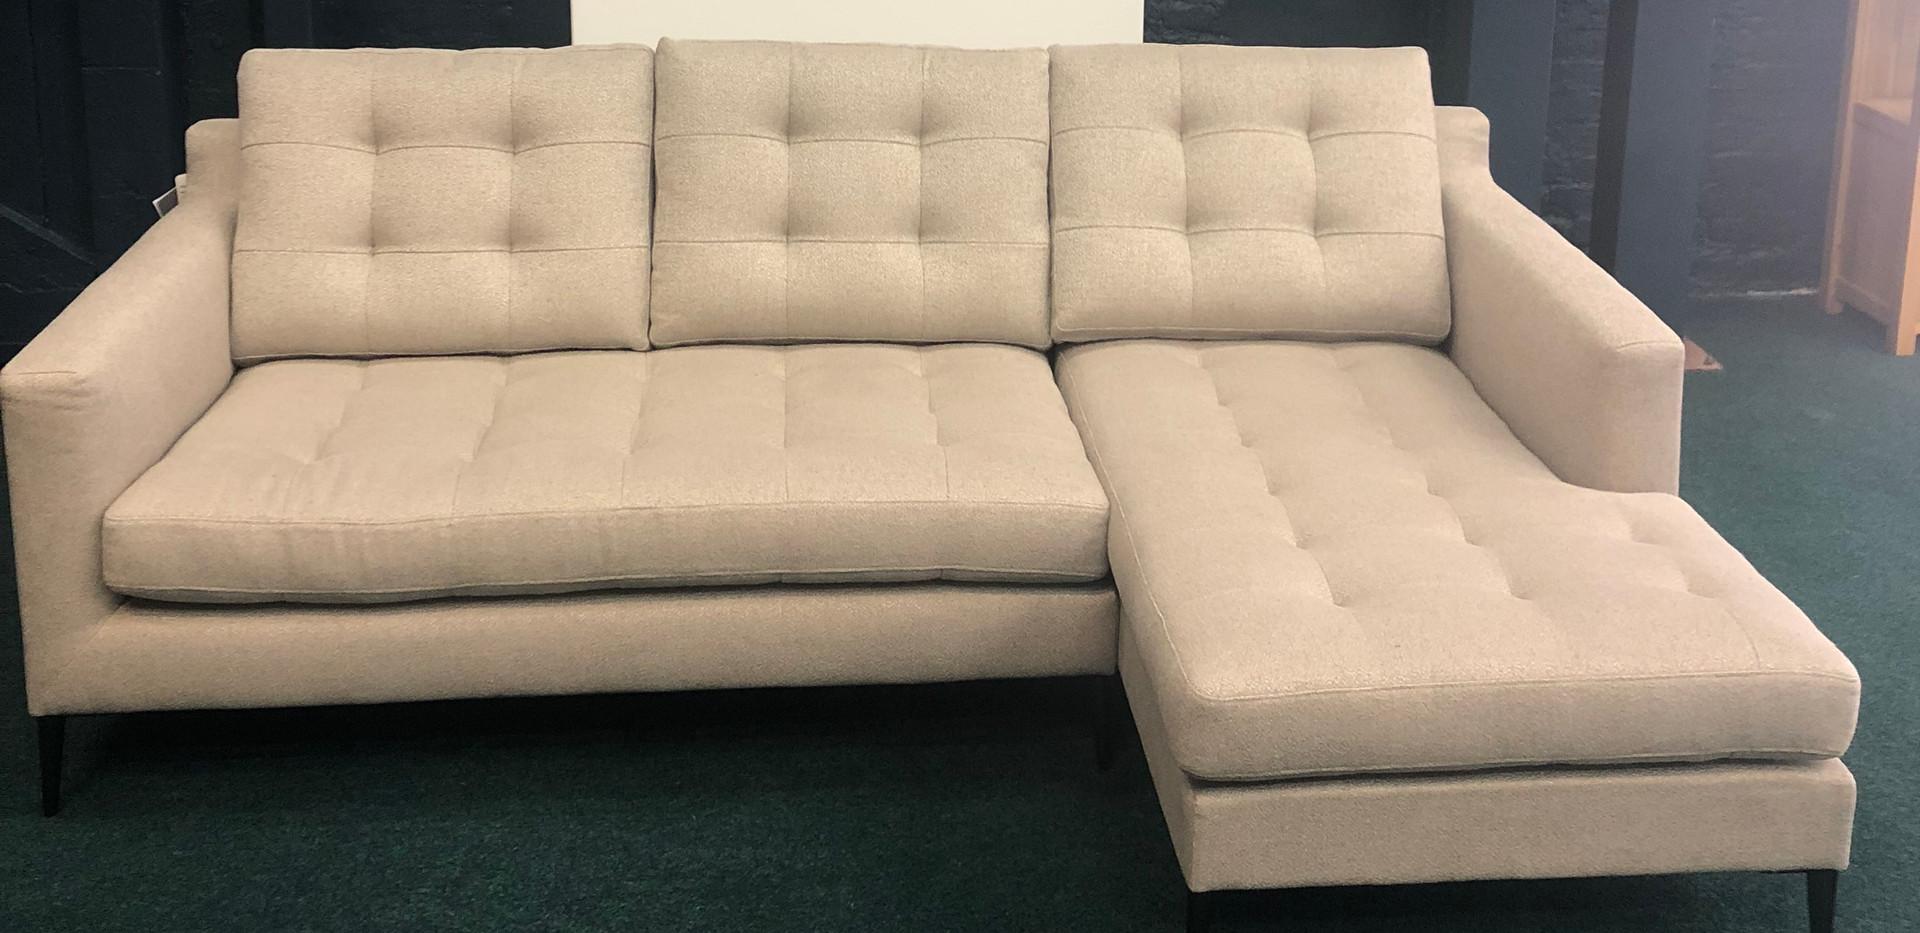 Draper Chaise Fabric